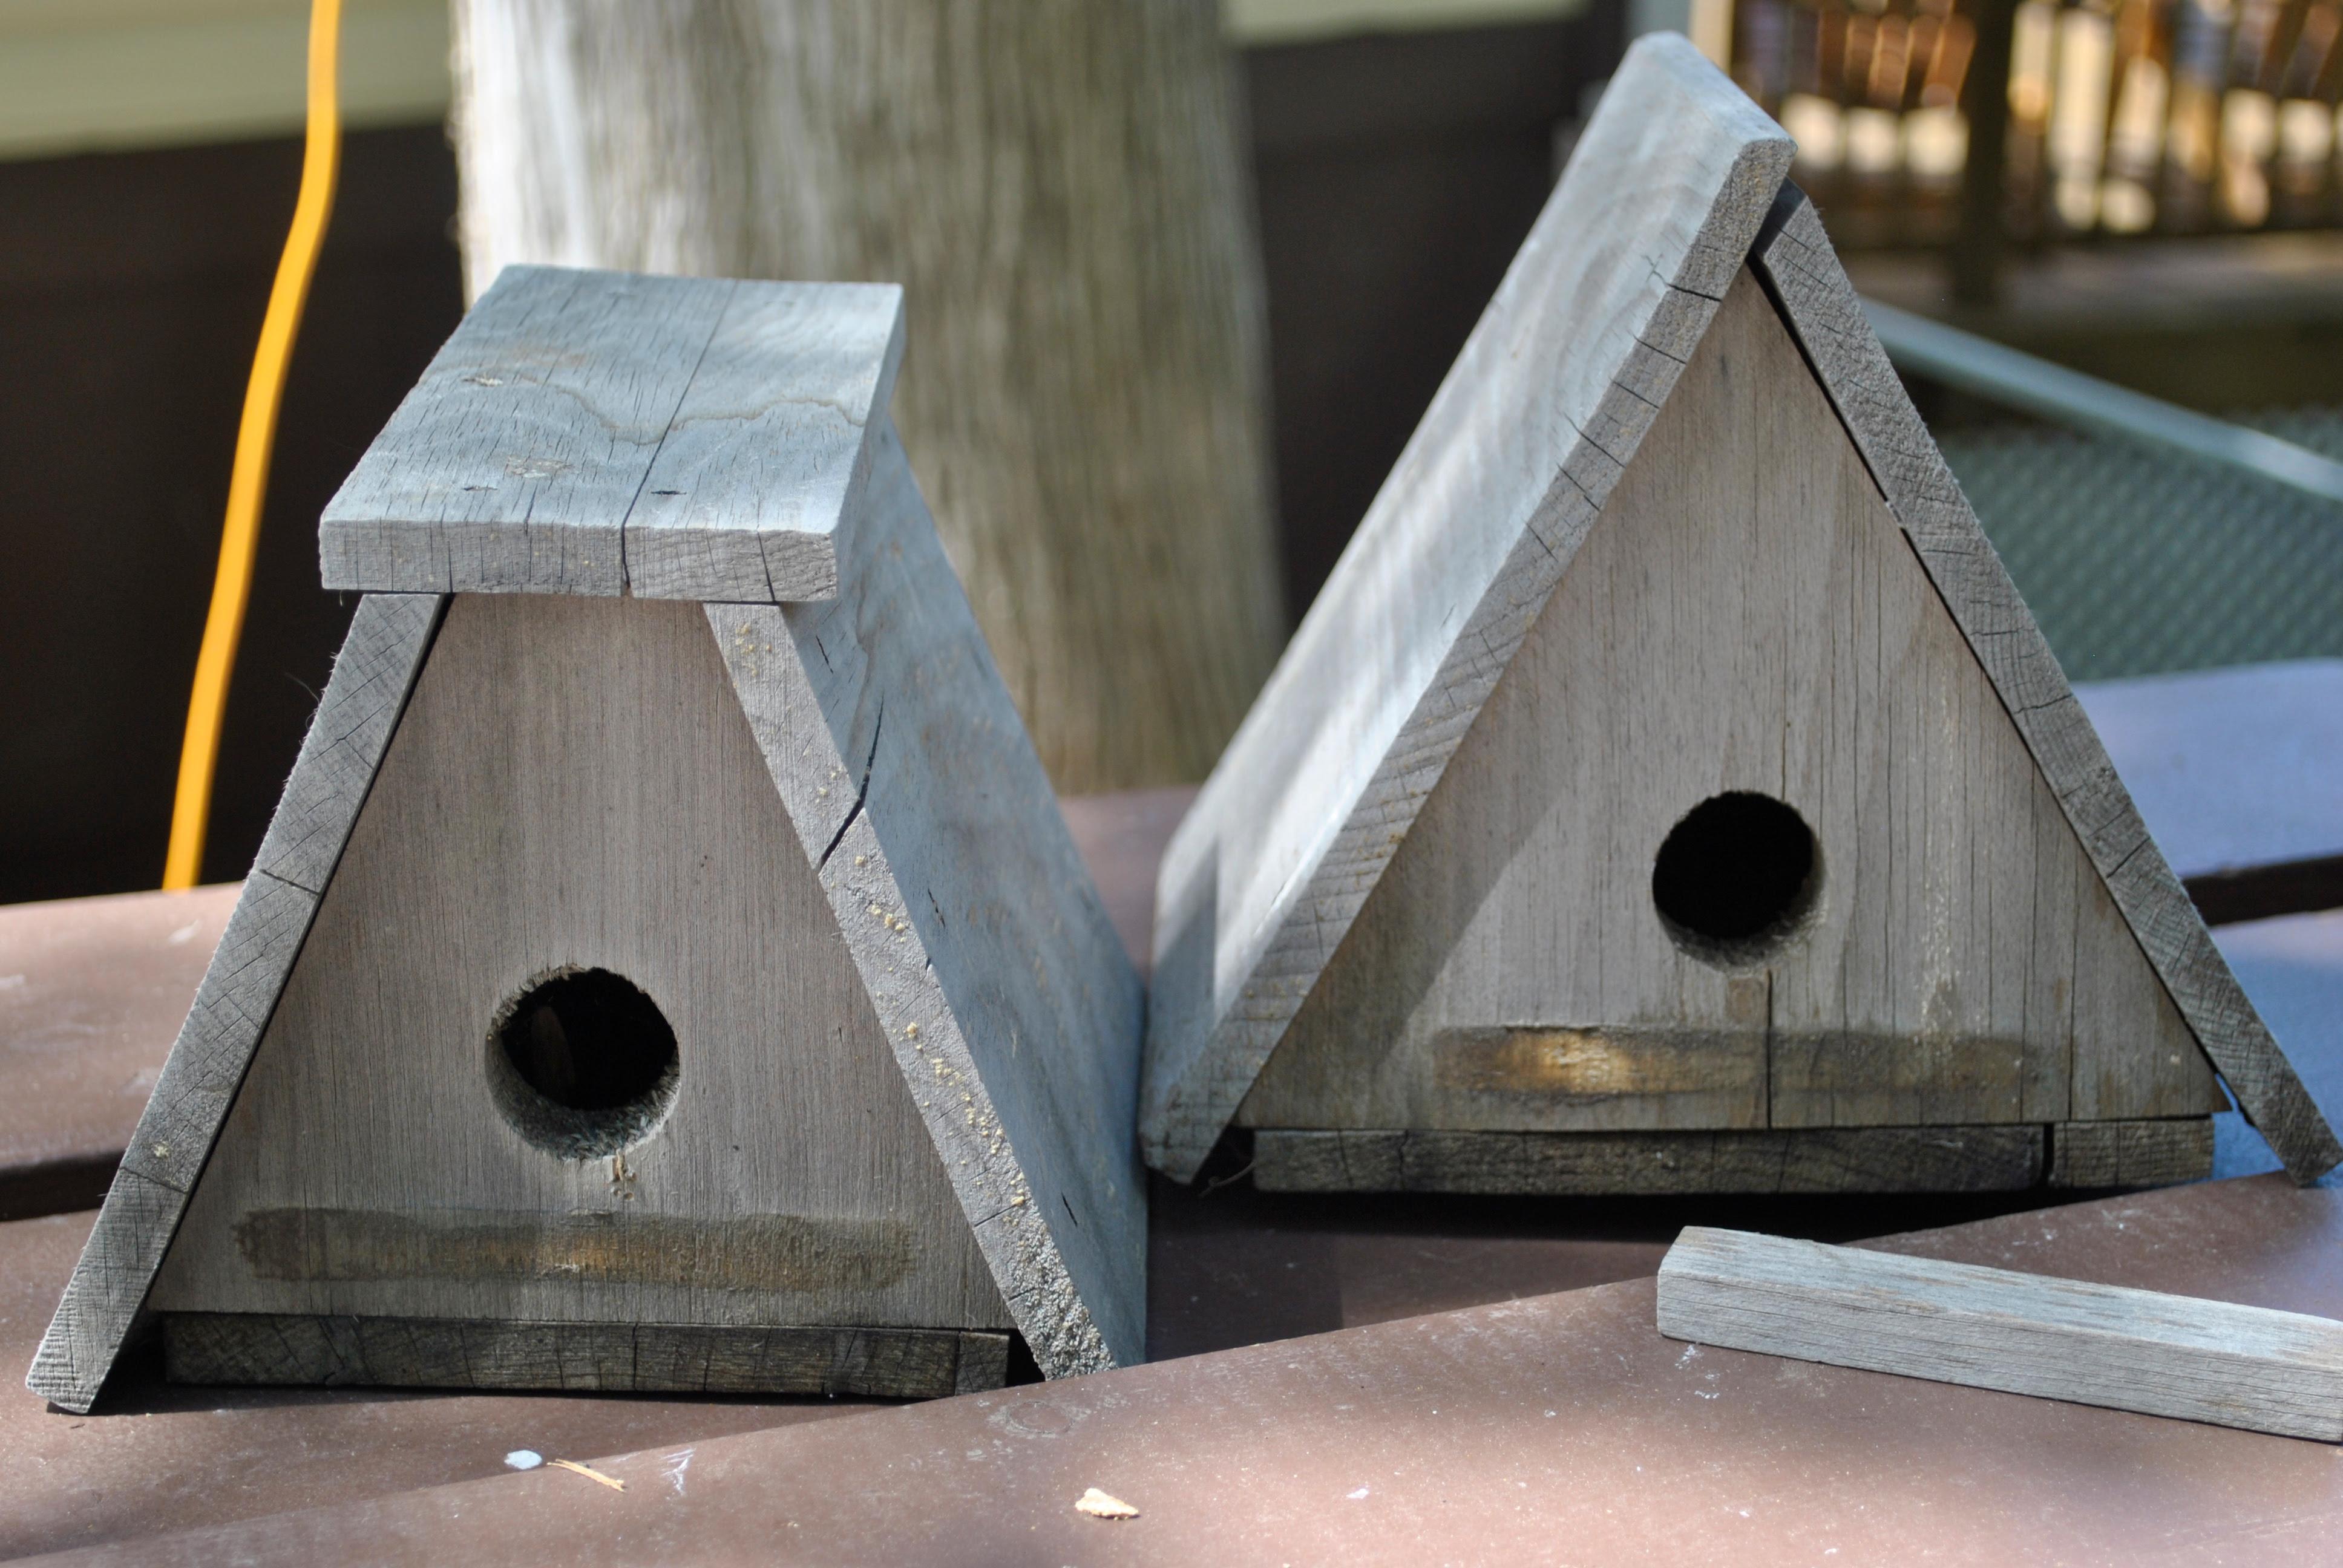 DIY Triangular Bird House  Plans PDF Download stackable